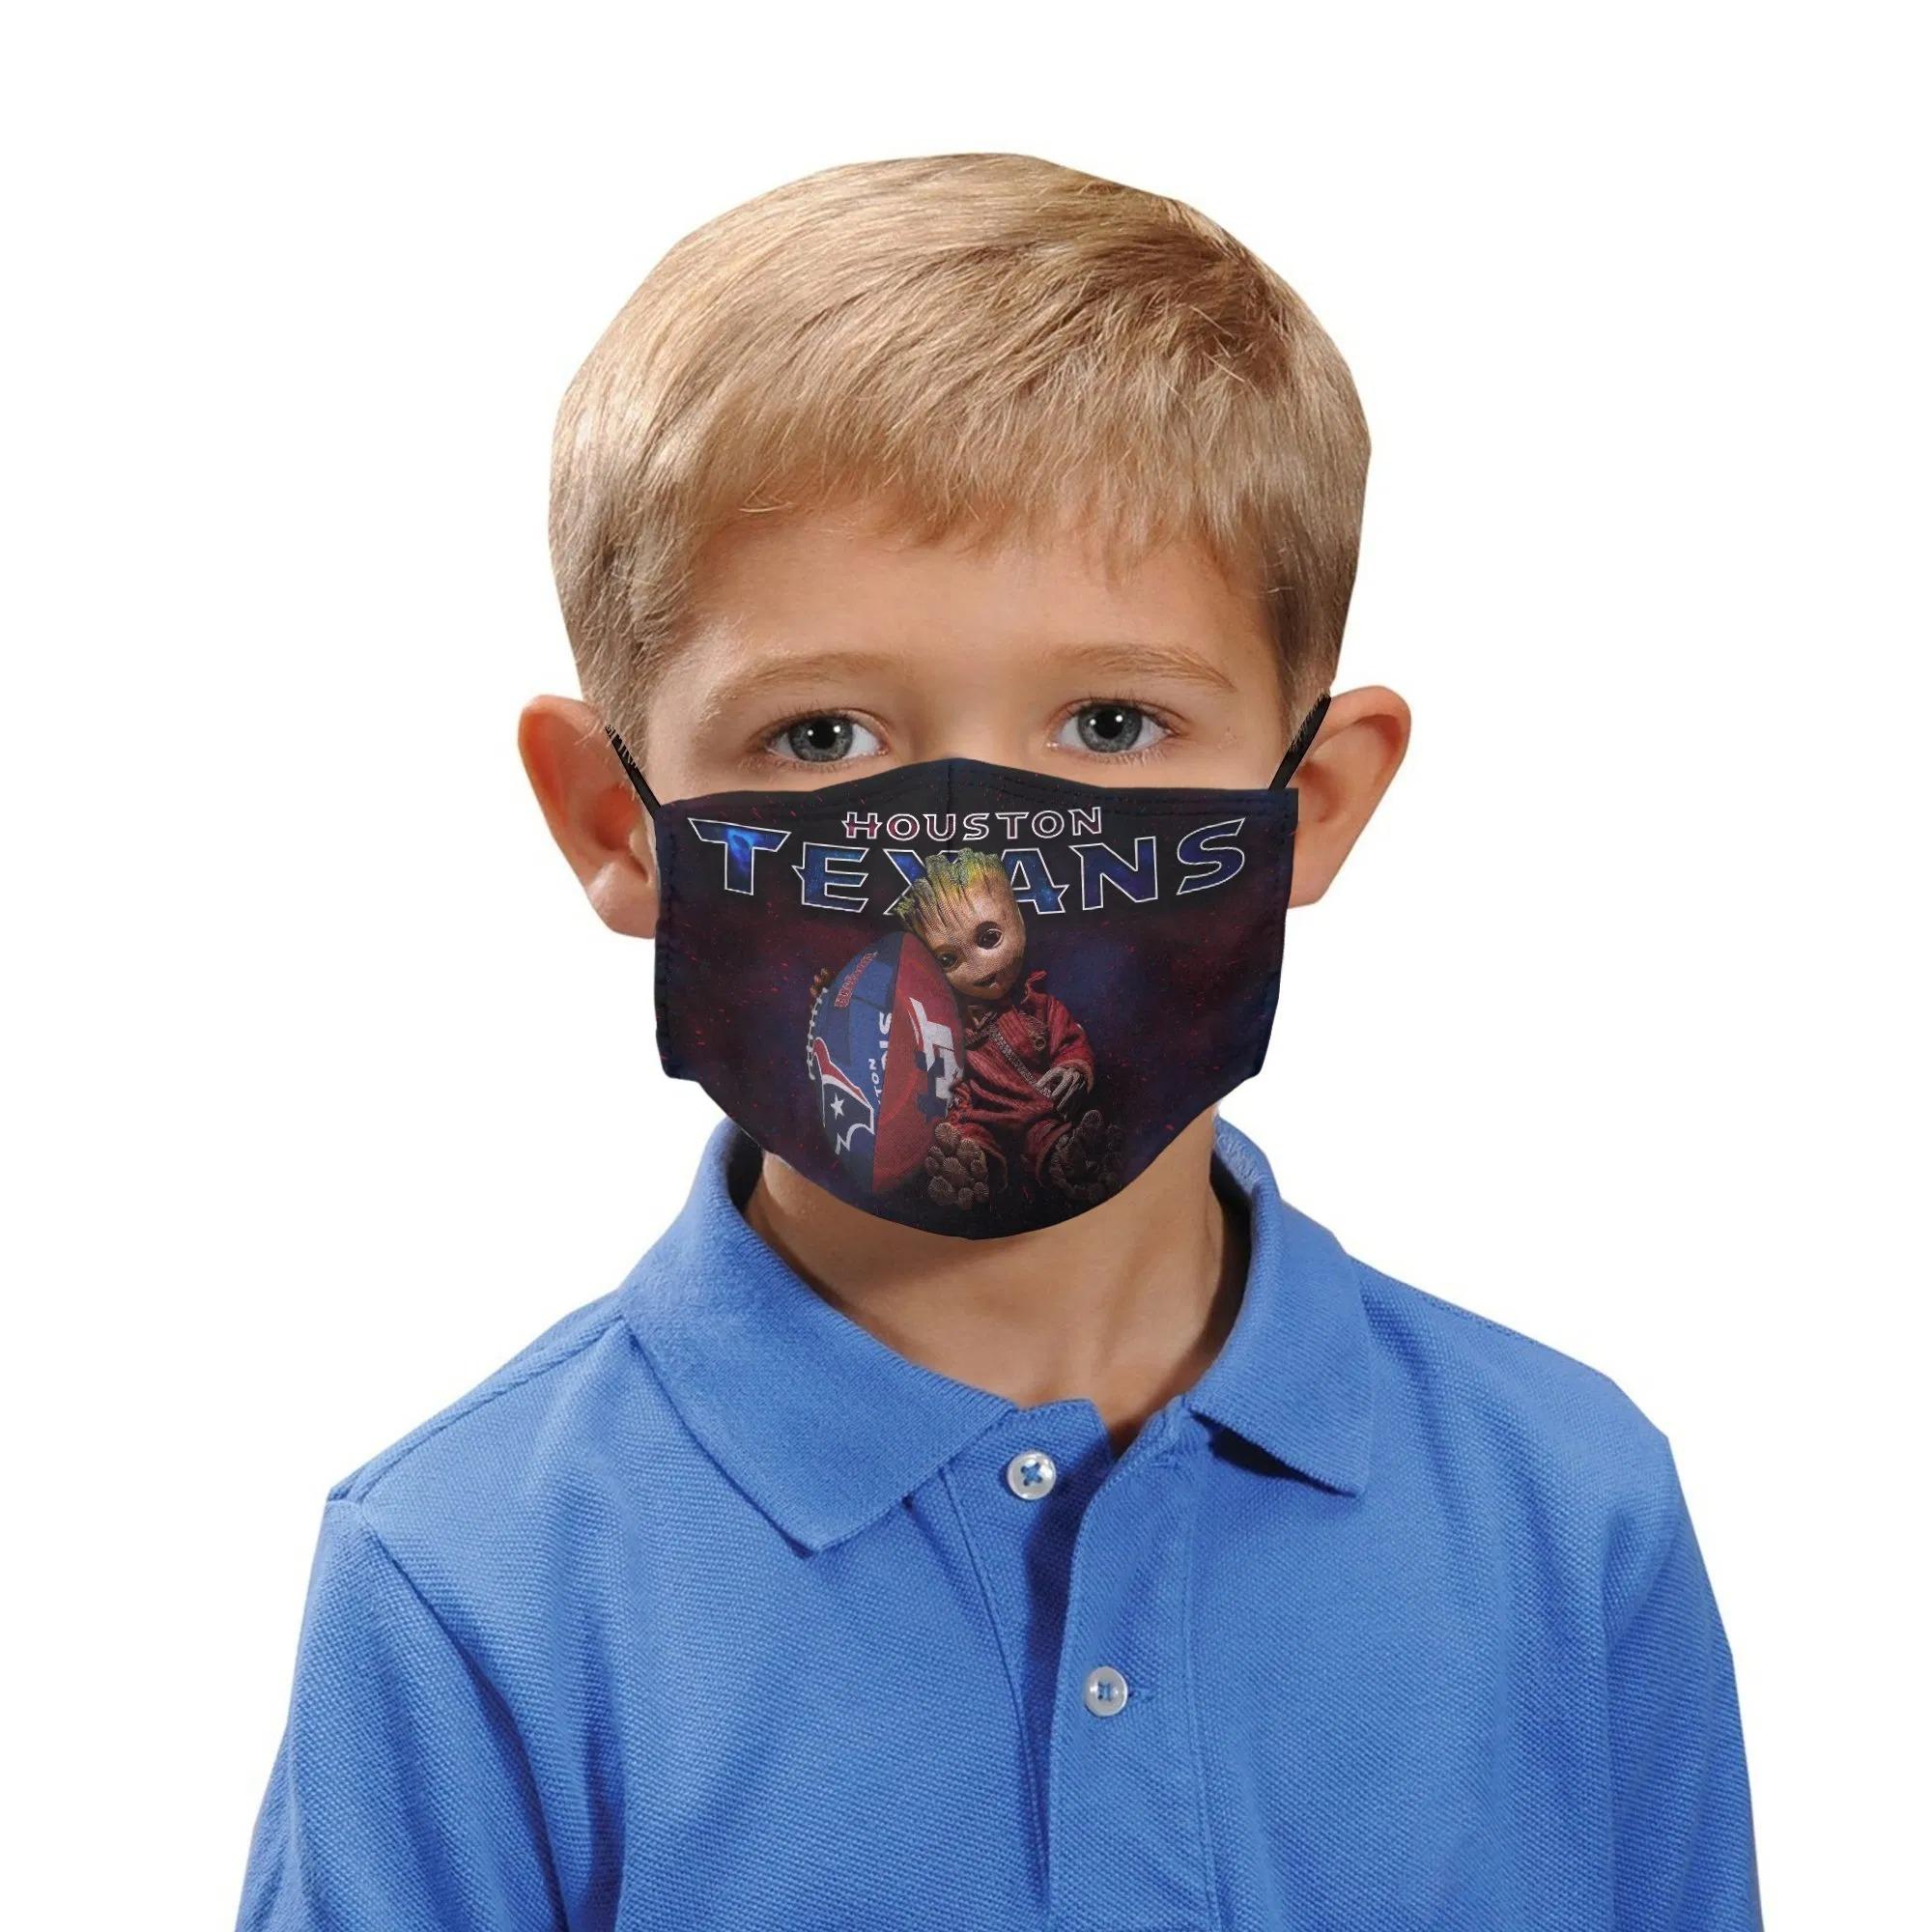 Baby Groot Houston Texans Face Masks1